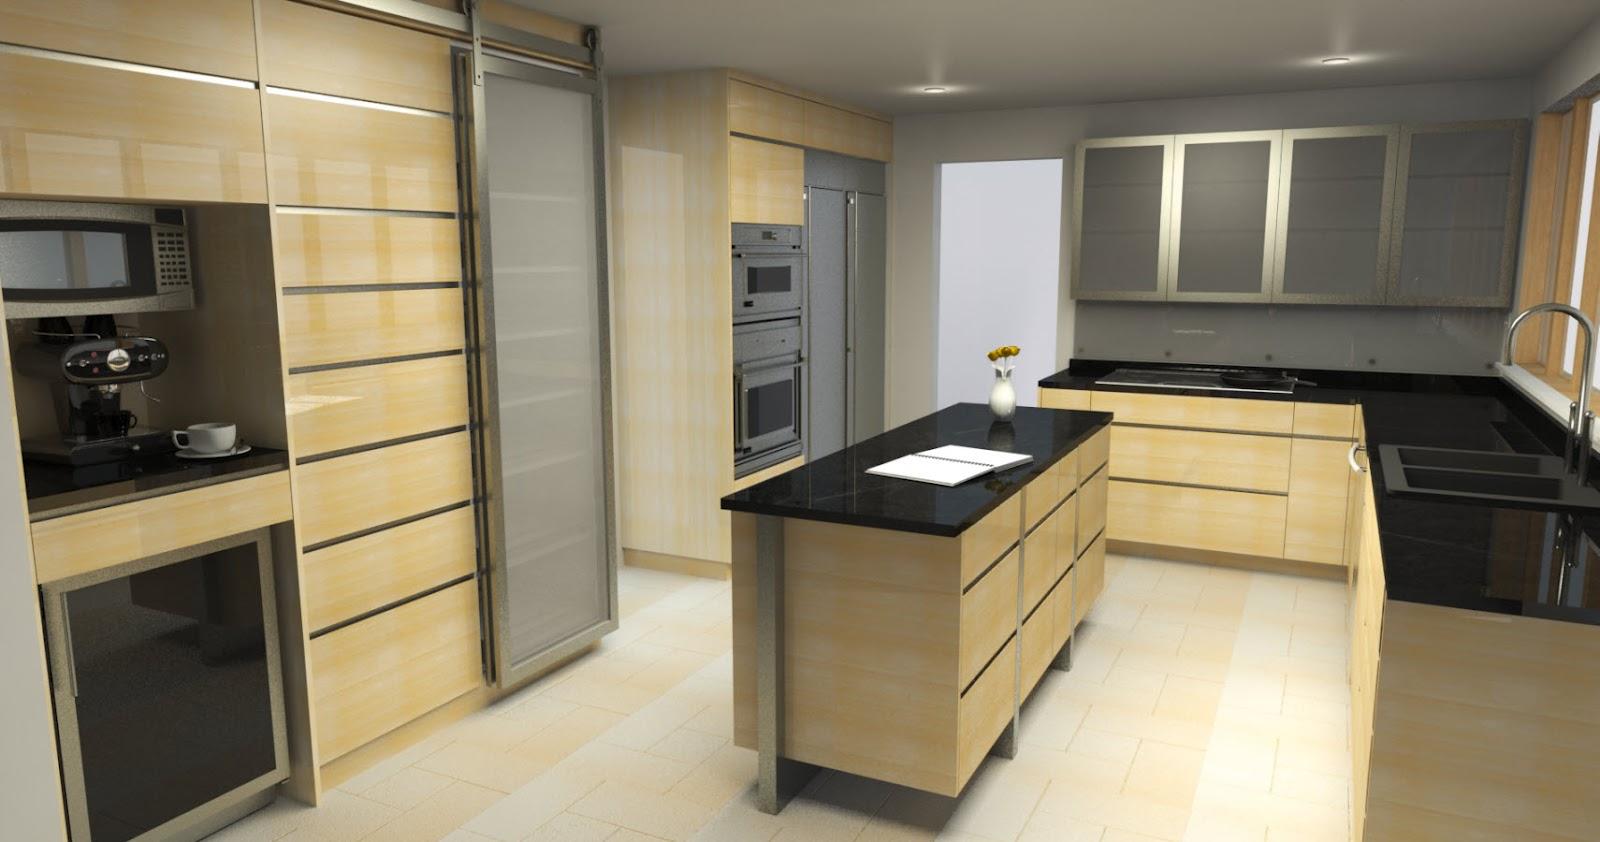 Devon ross cg architectural visualization for Kitchen designs sketchup